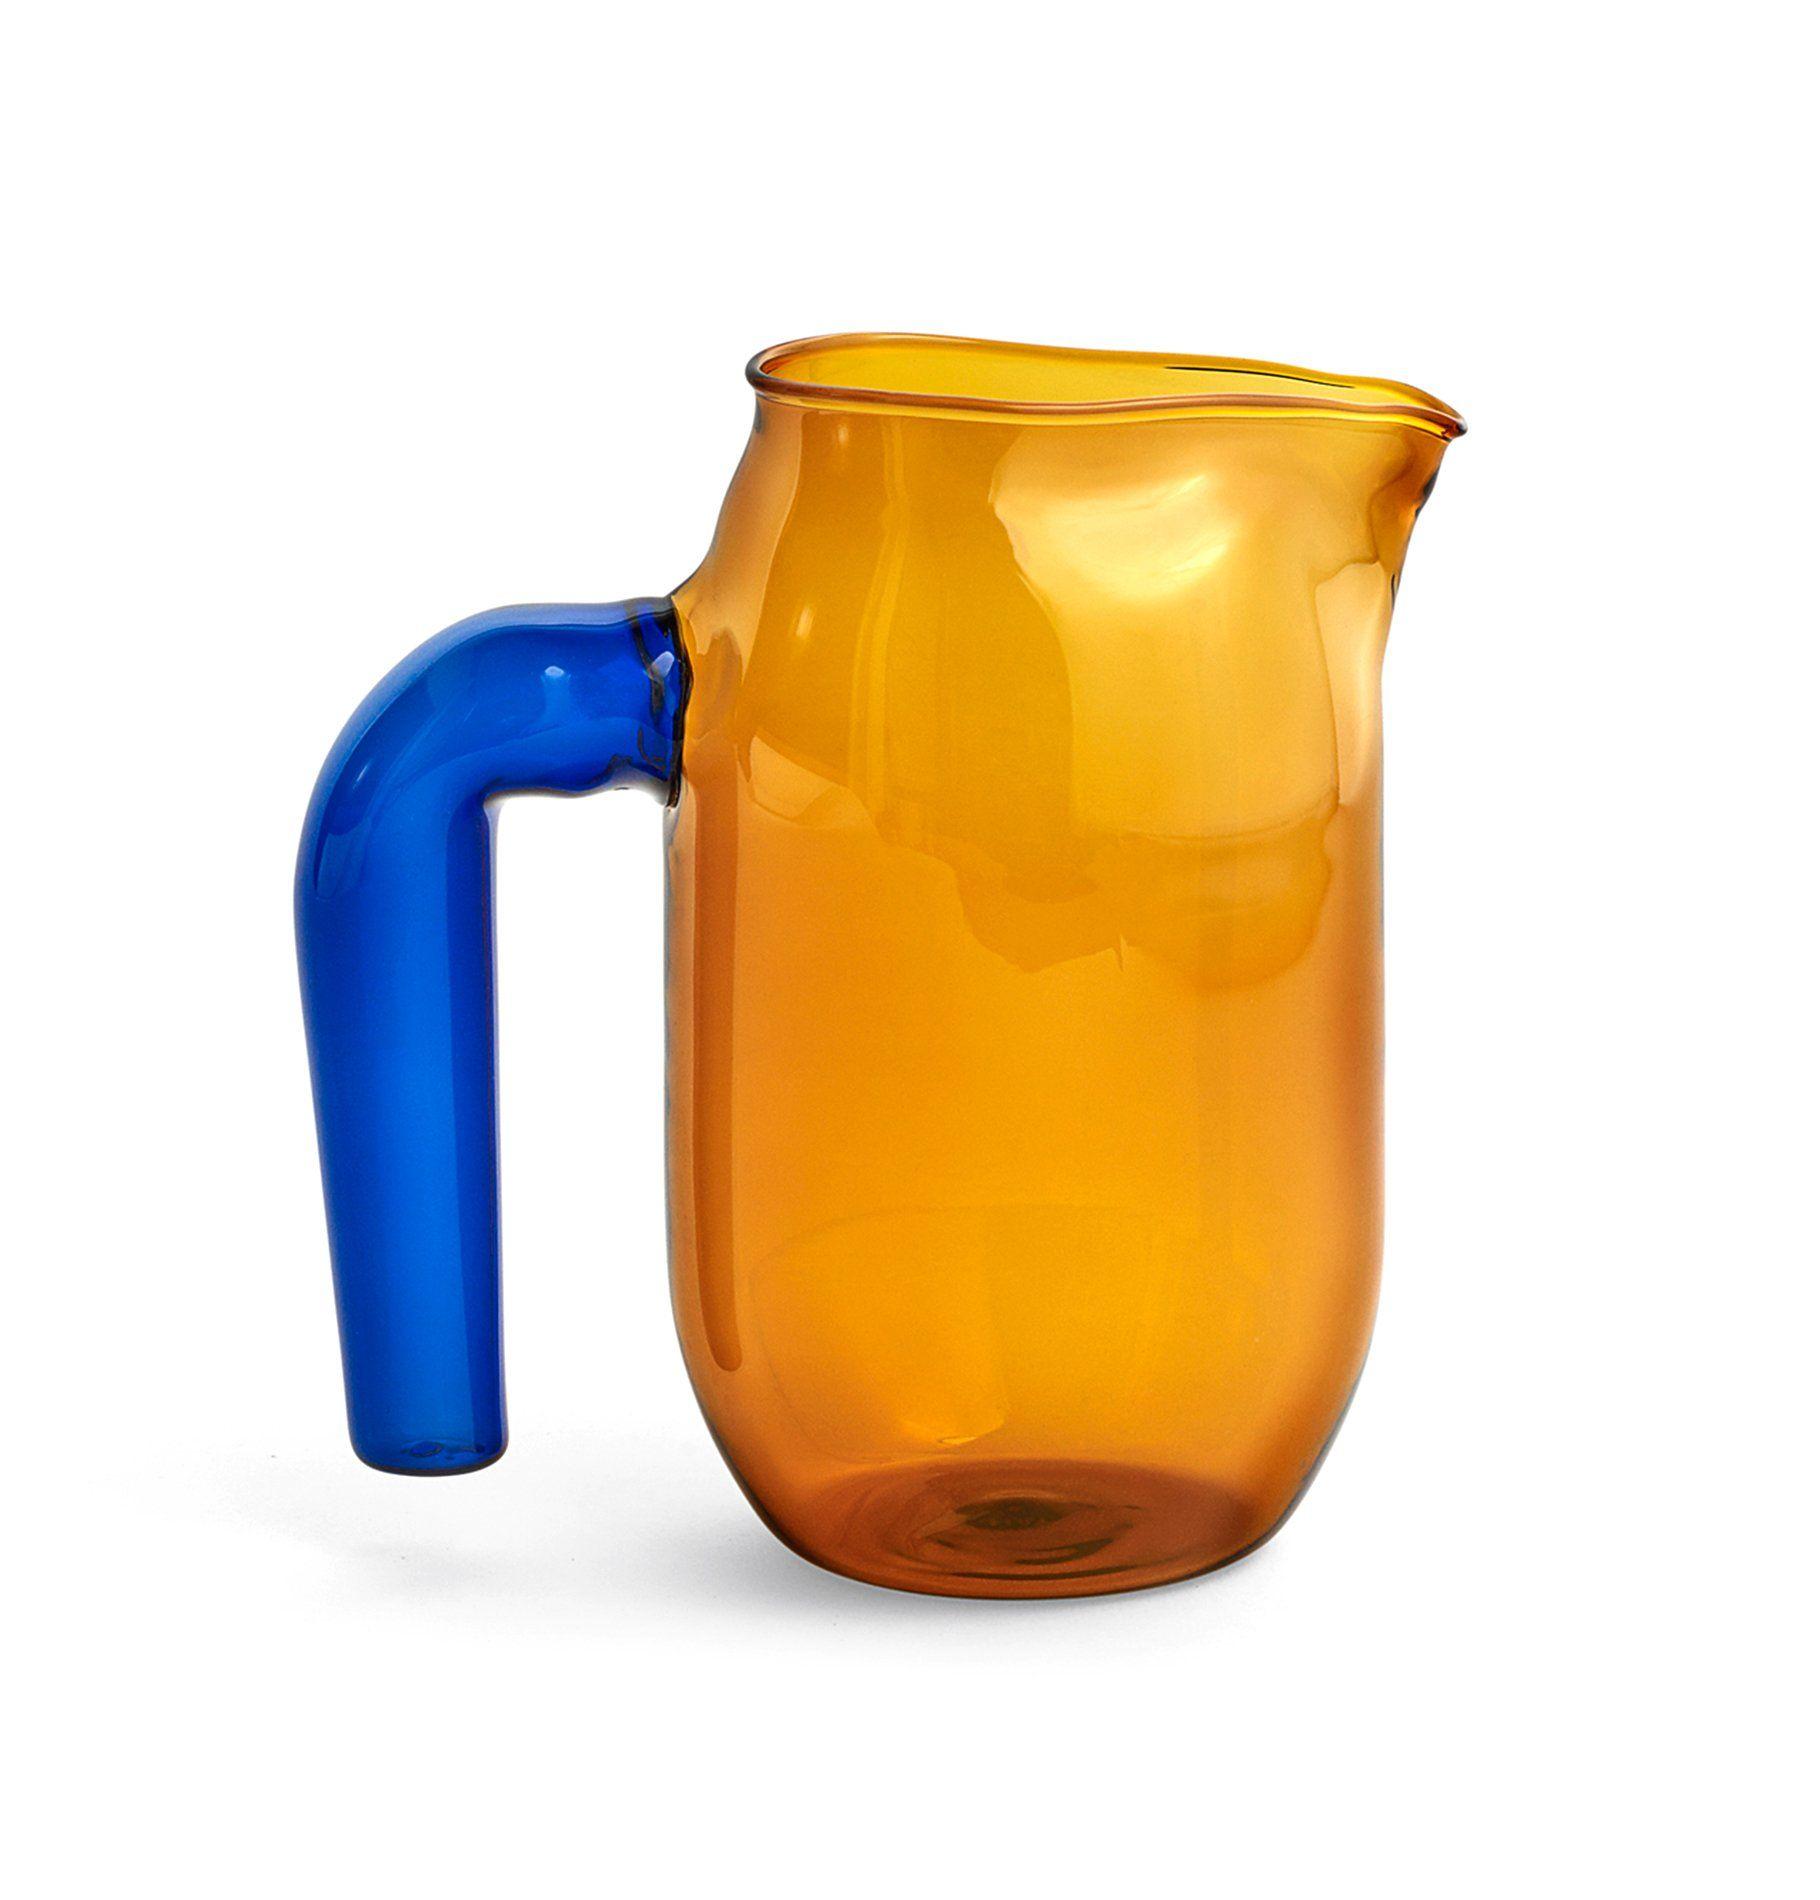 HAY Jug Small Amber Glass jug, Glass, Borosilicate glass